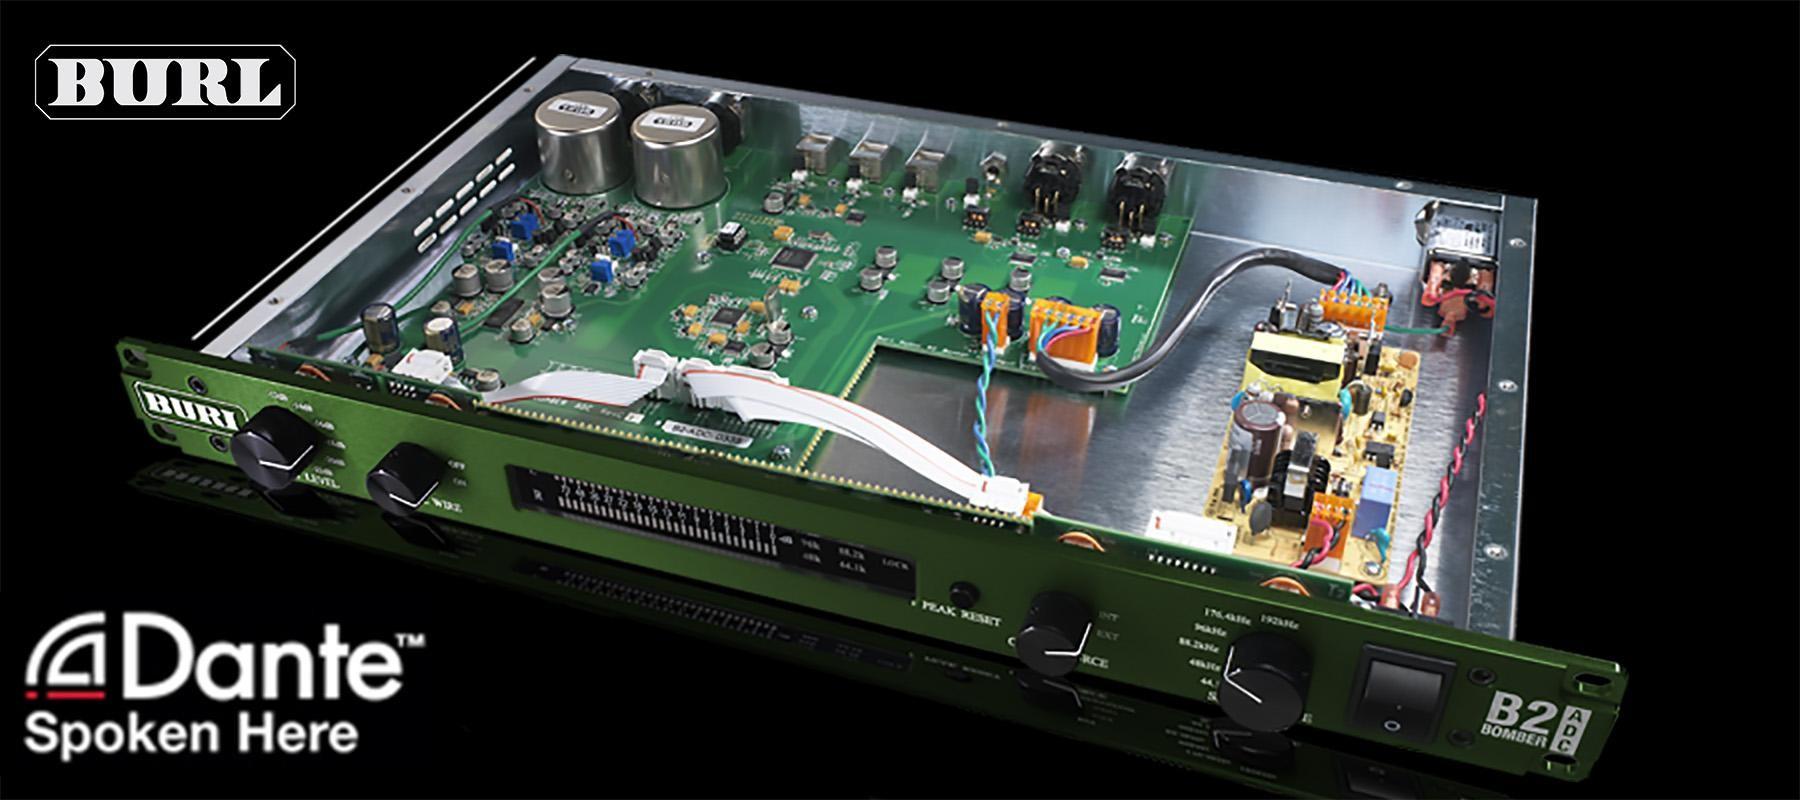 BURL Audio B2 Bomber ADC Dante Open